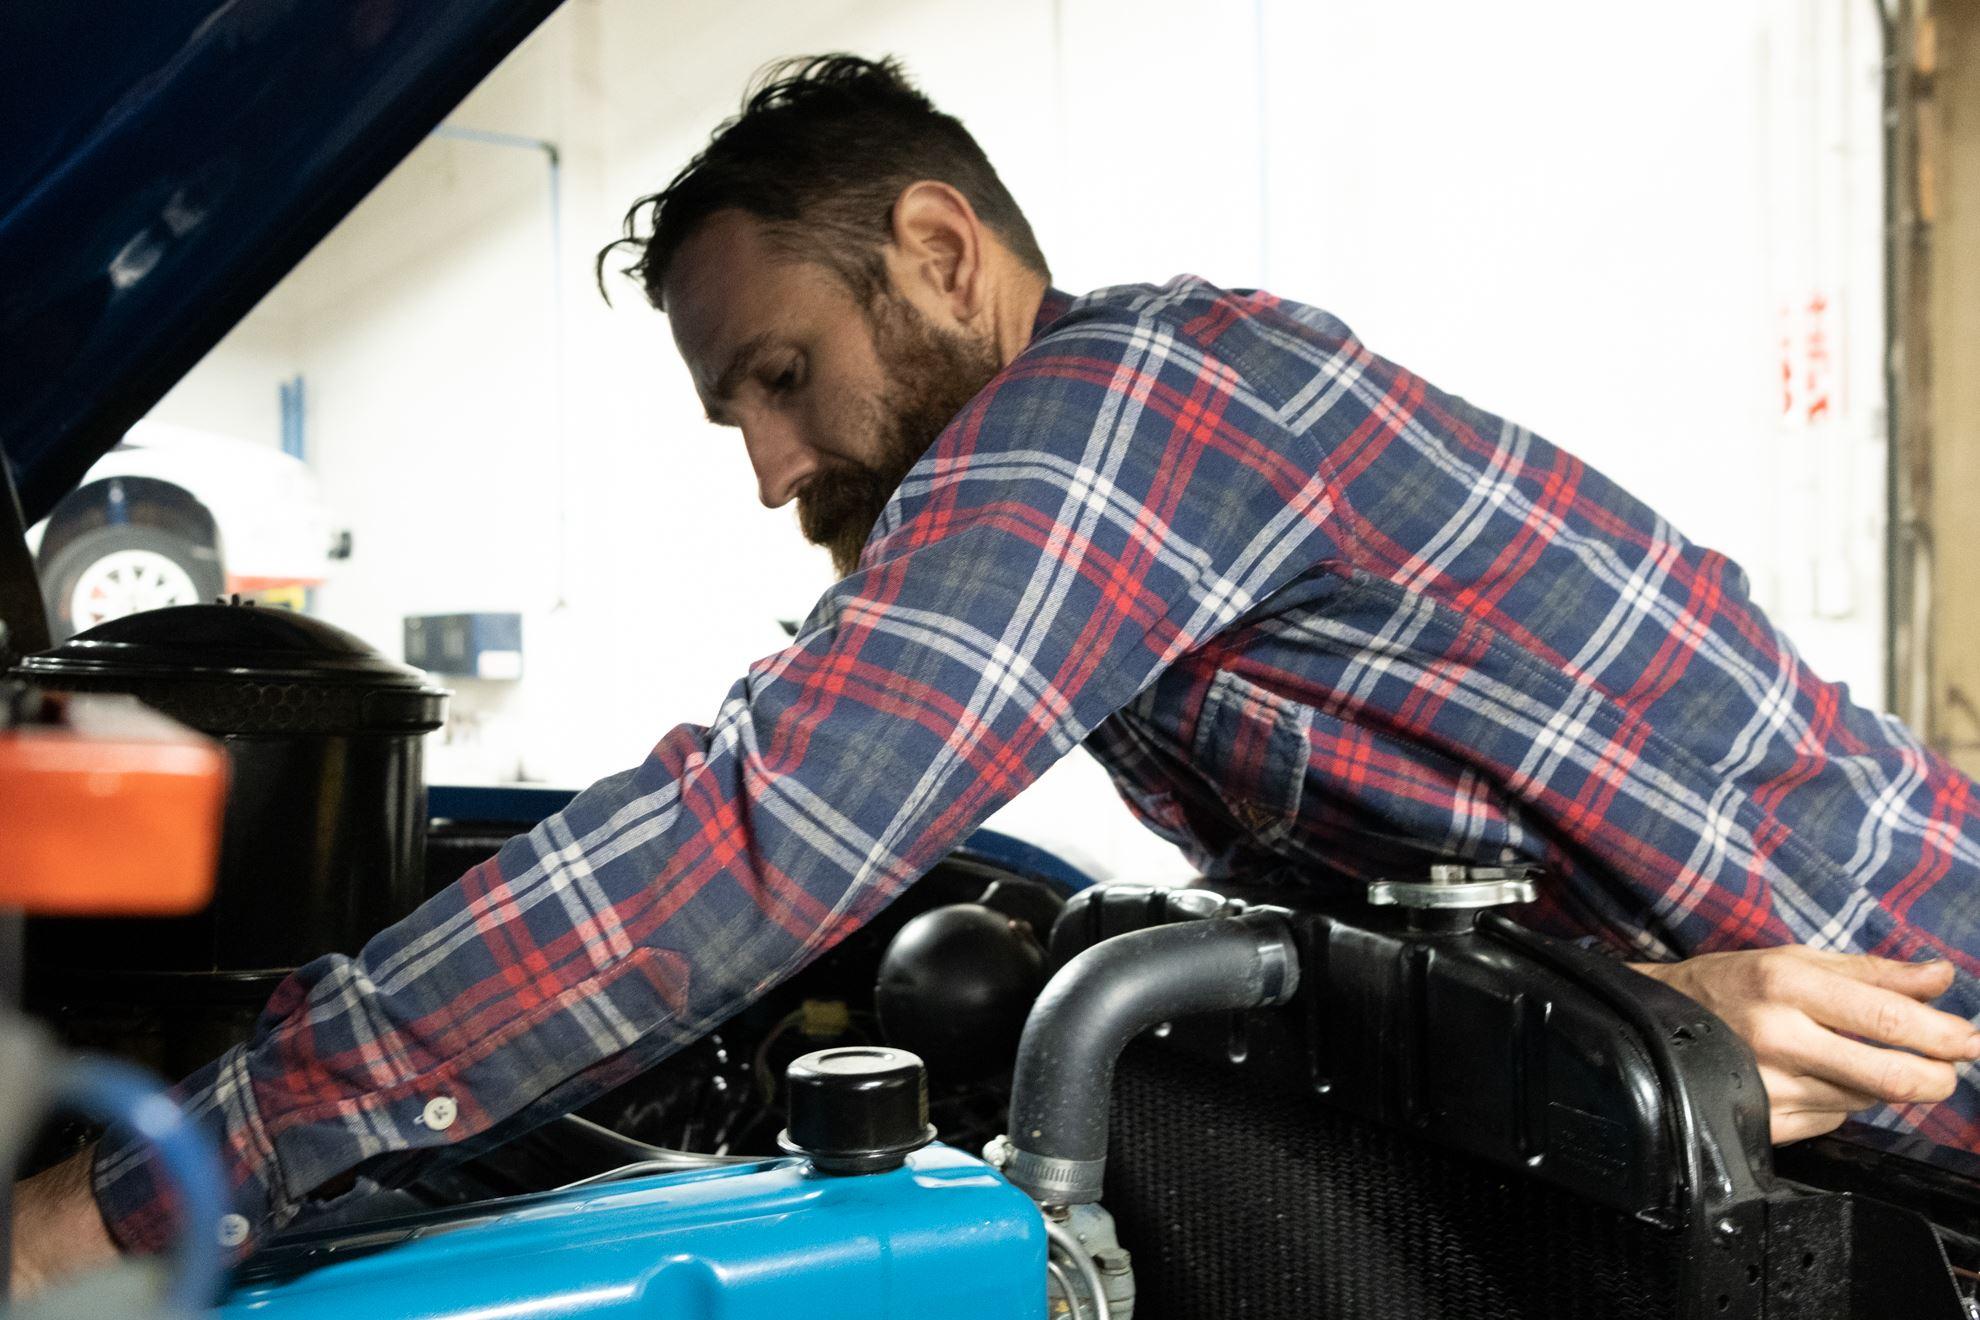 Aaron Kaufman Arclight fab shifting gears working on 55 chevy truck